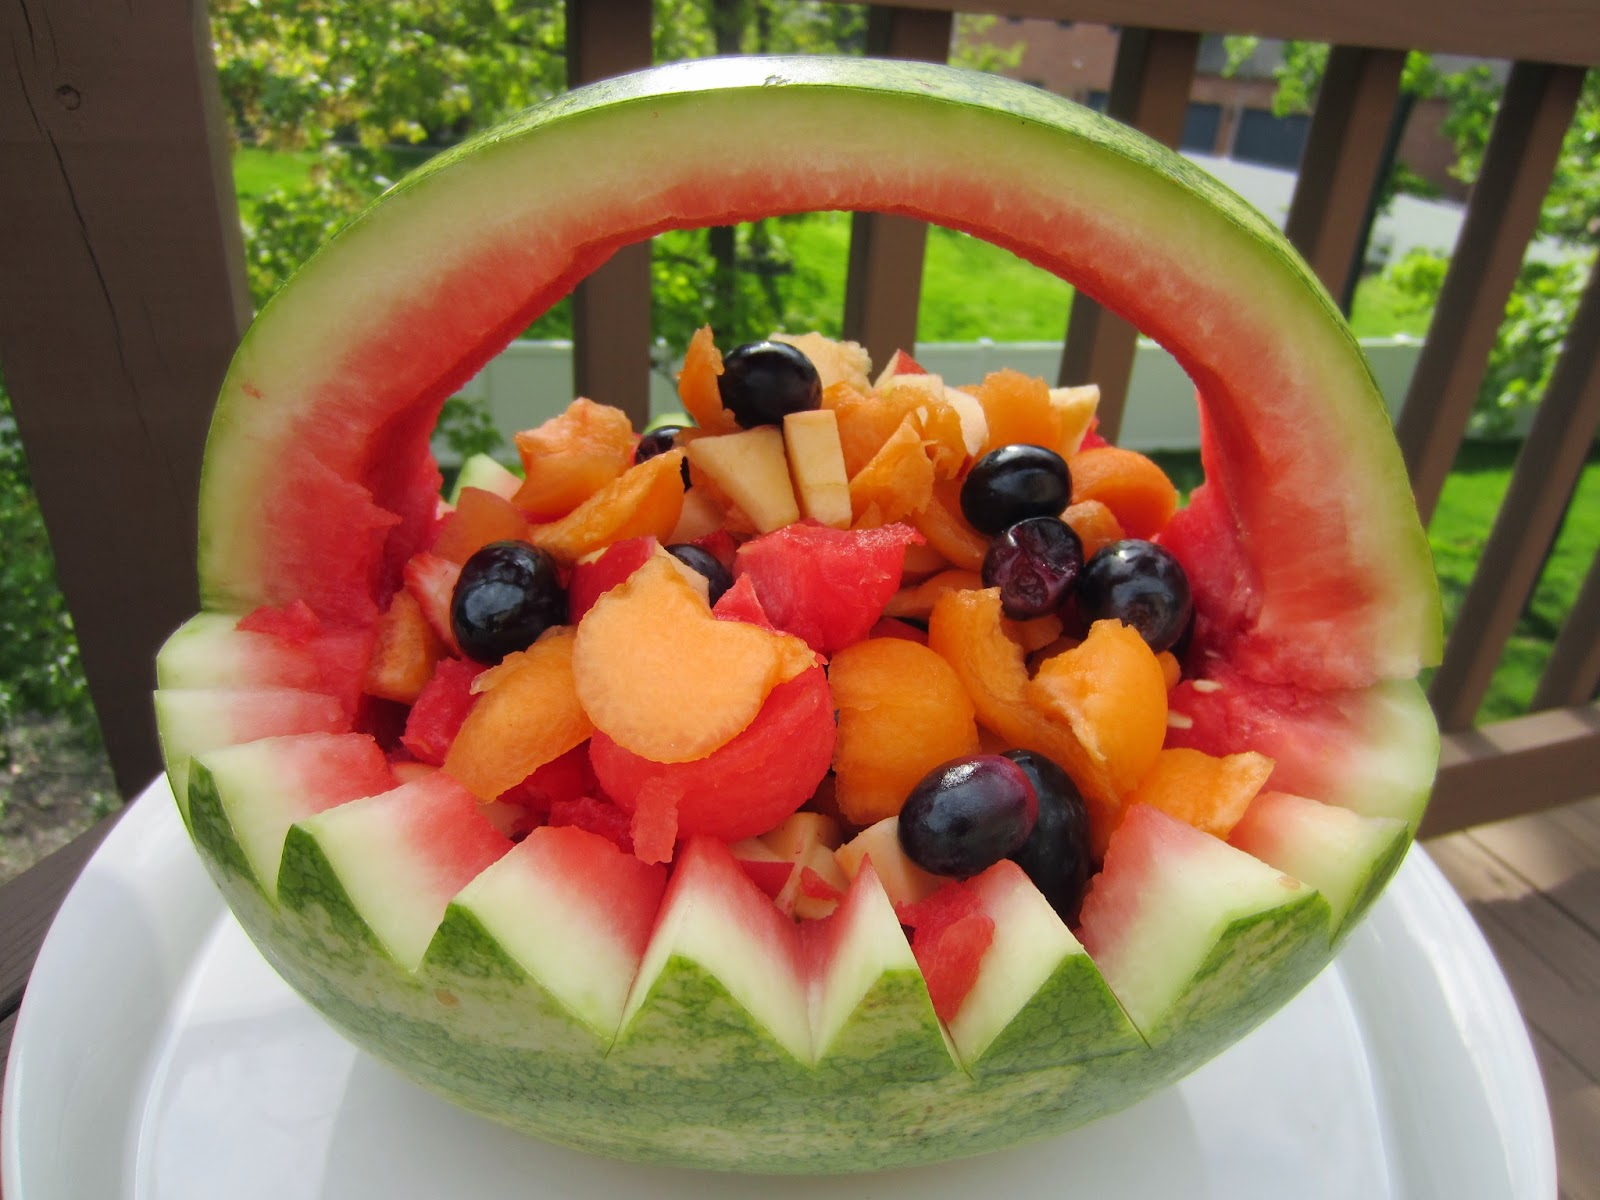 watermelon basket carving patterns